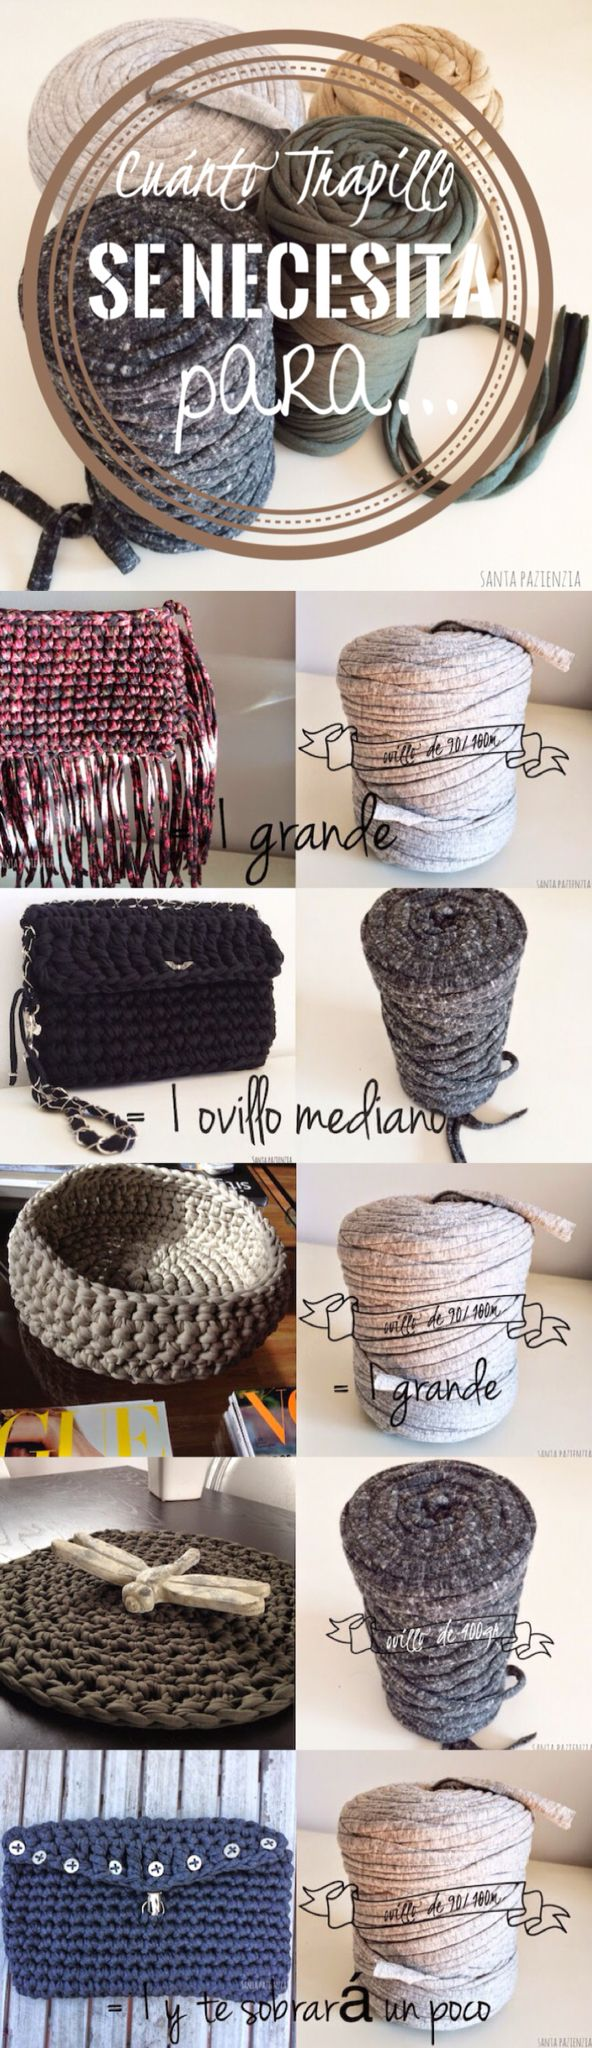 Cuánto trapillo hace falta para... Bolsos, clutch, cesto... DIY  T-Shirt Yarn Ideas